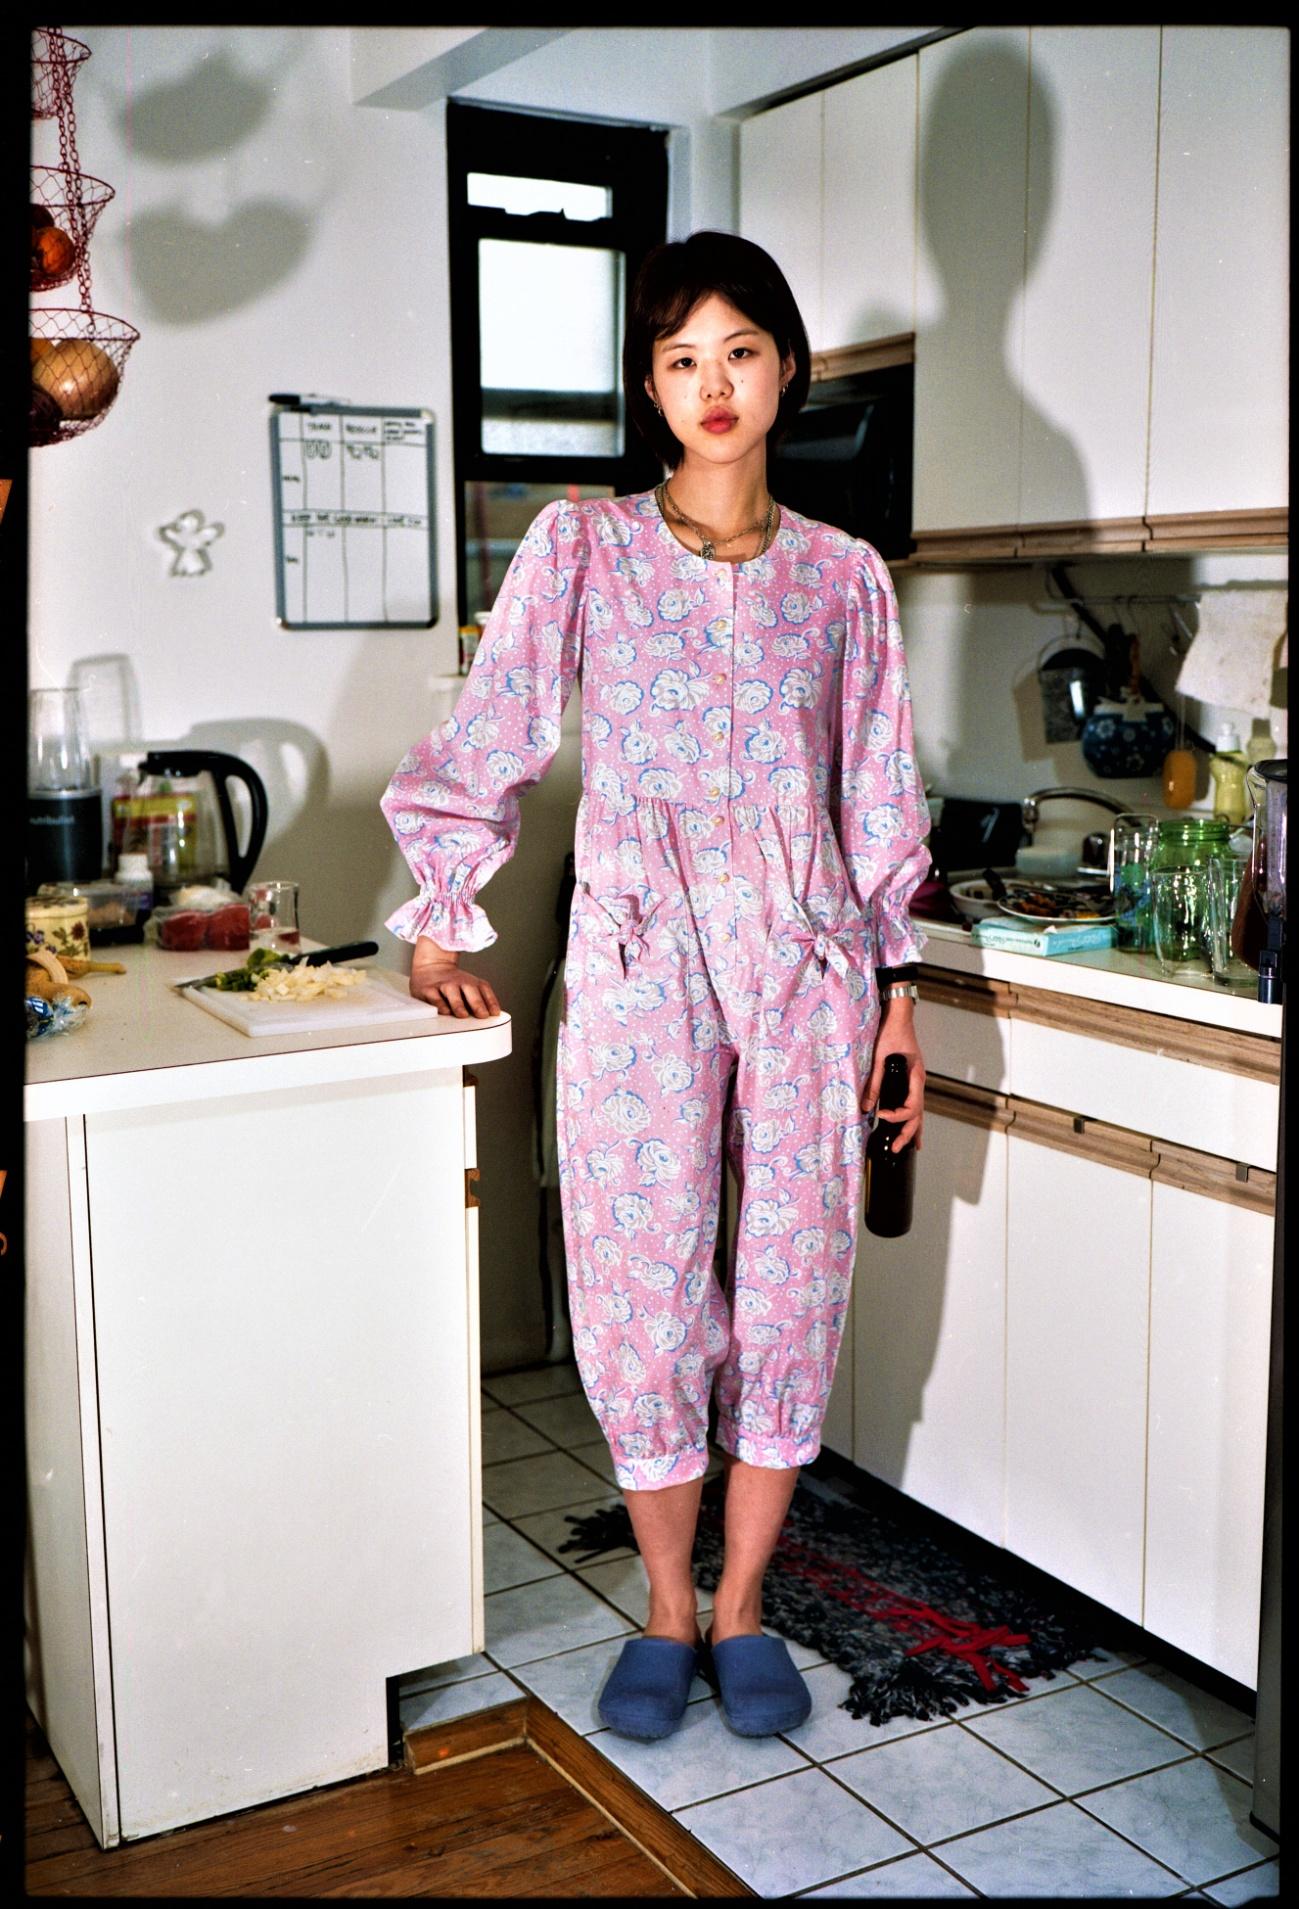 NYFW 2 -batsheva-RTW-fall-21-credit-Alexei-Hay pink jumpsuit cropped.jpg